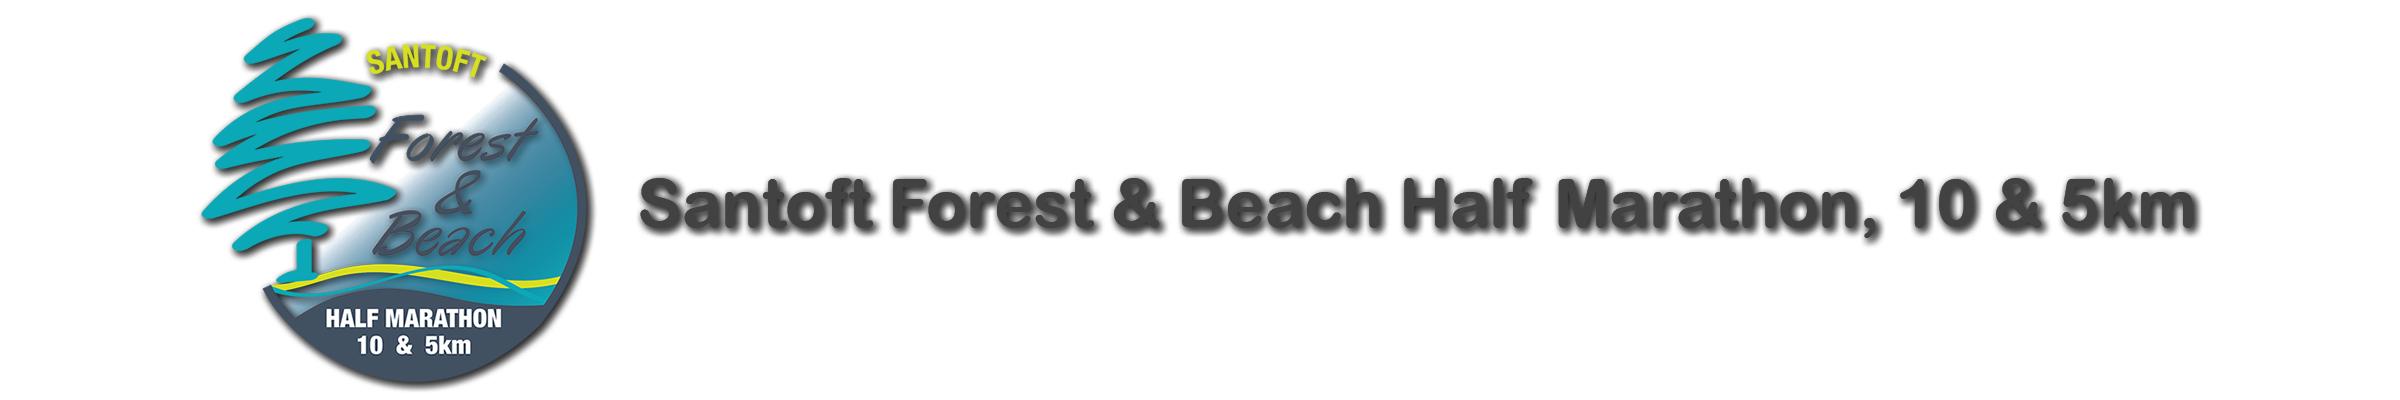 web logo2 copy